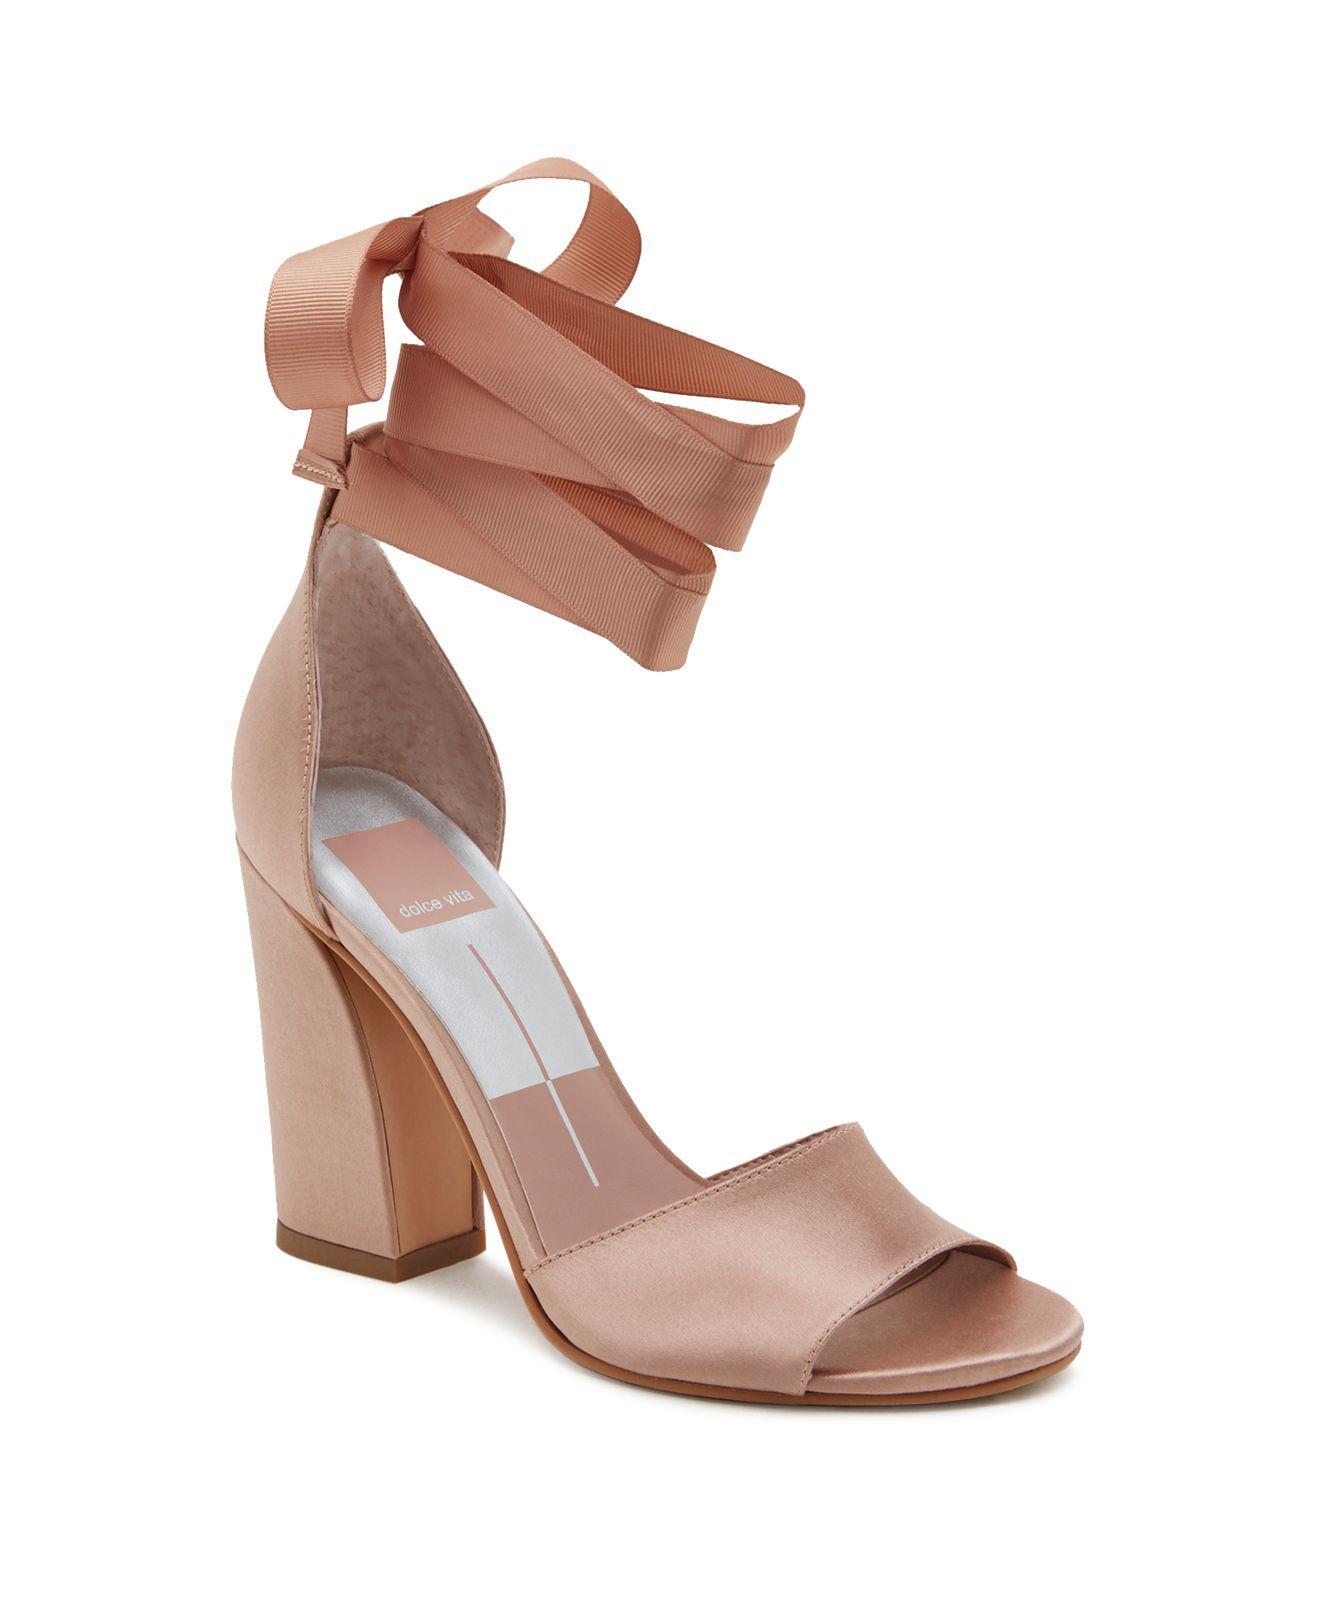 Platino Shoes Uk